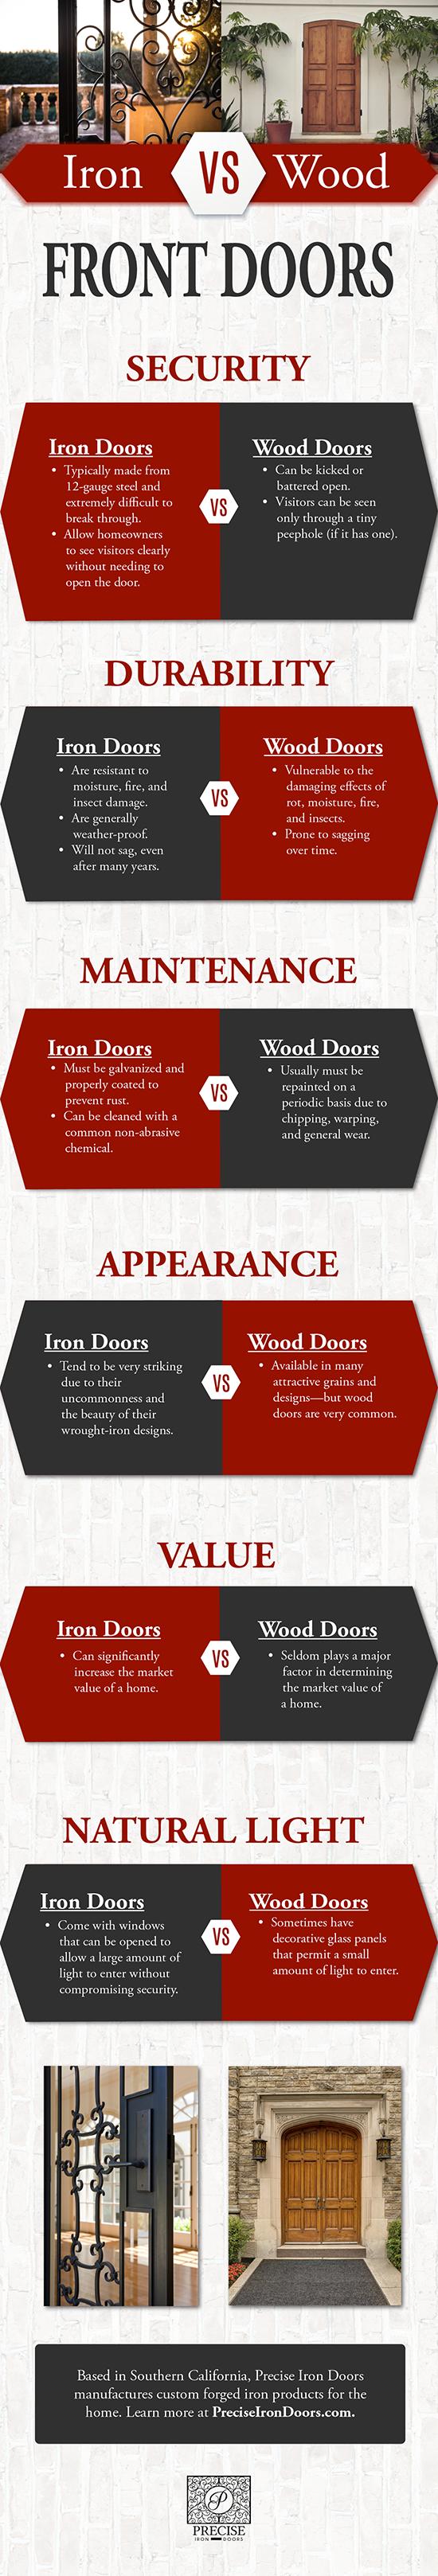 Iron vs. Wood Front Doors Infographic